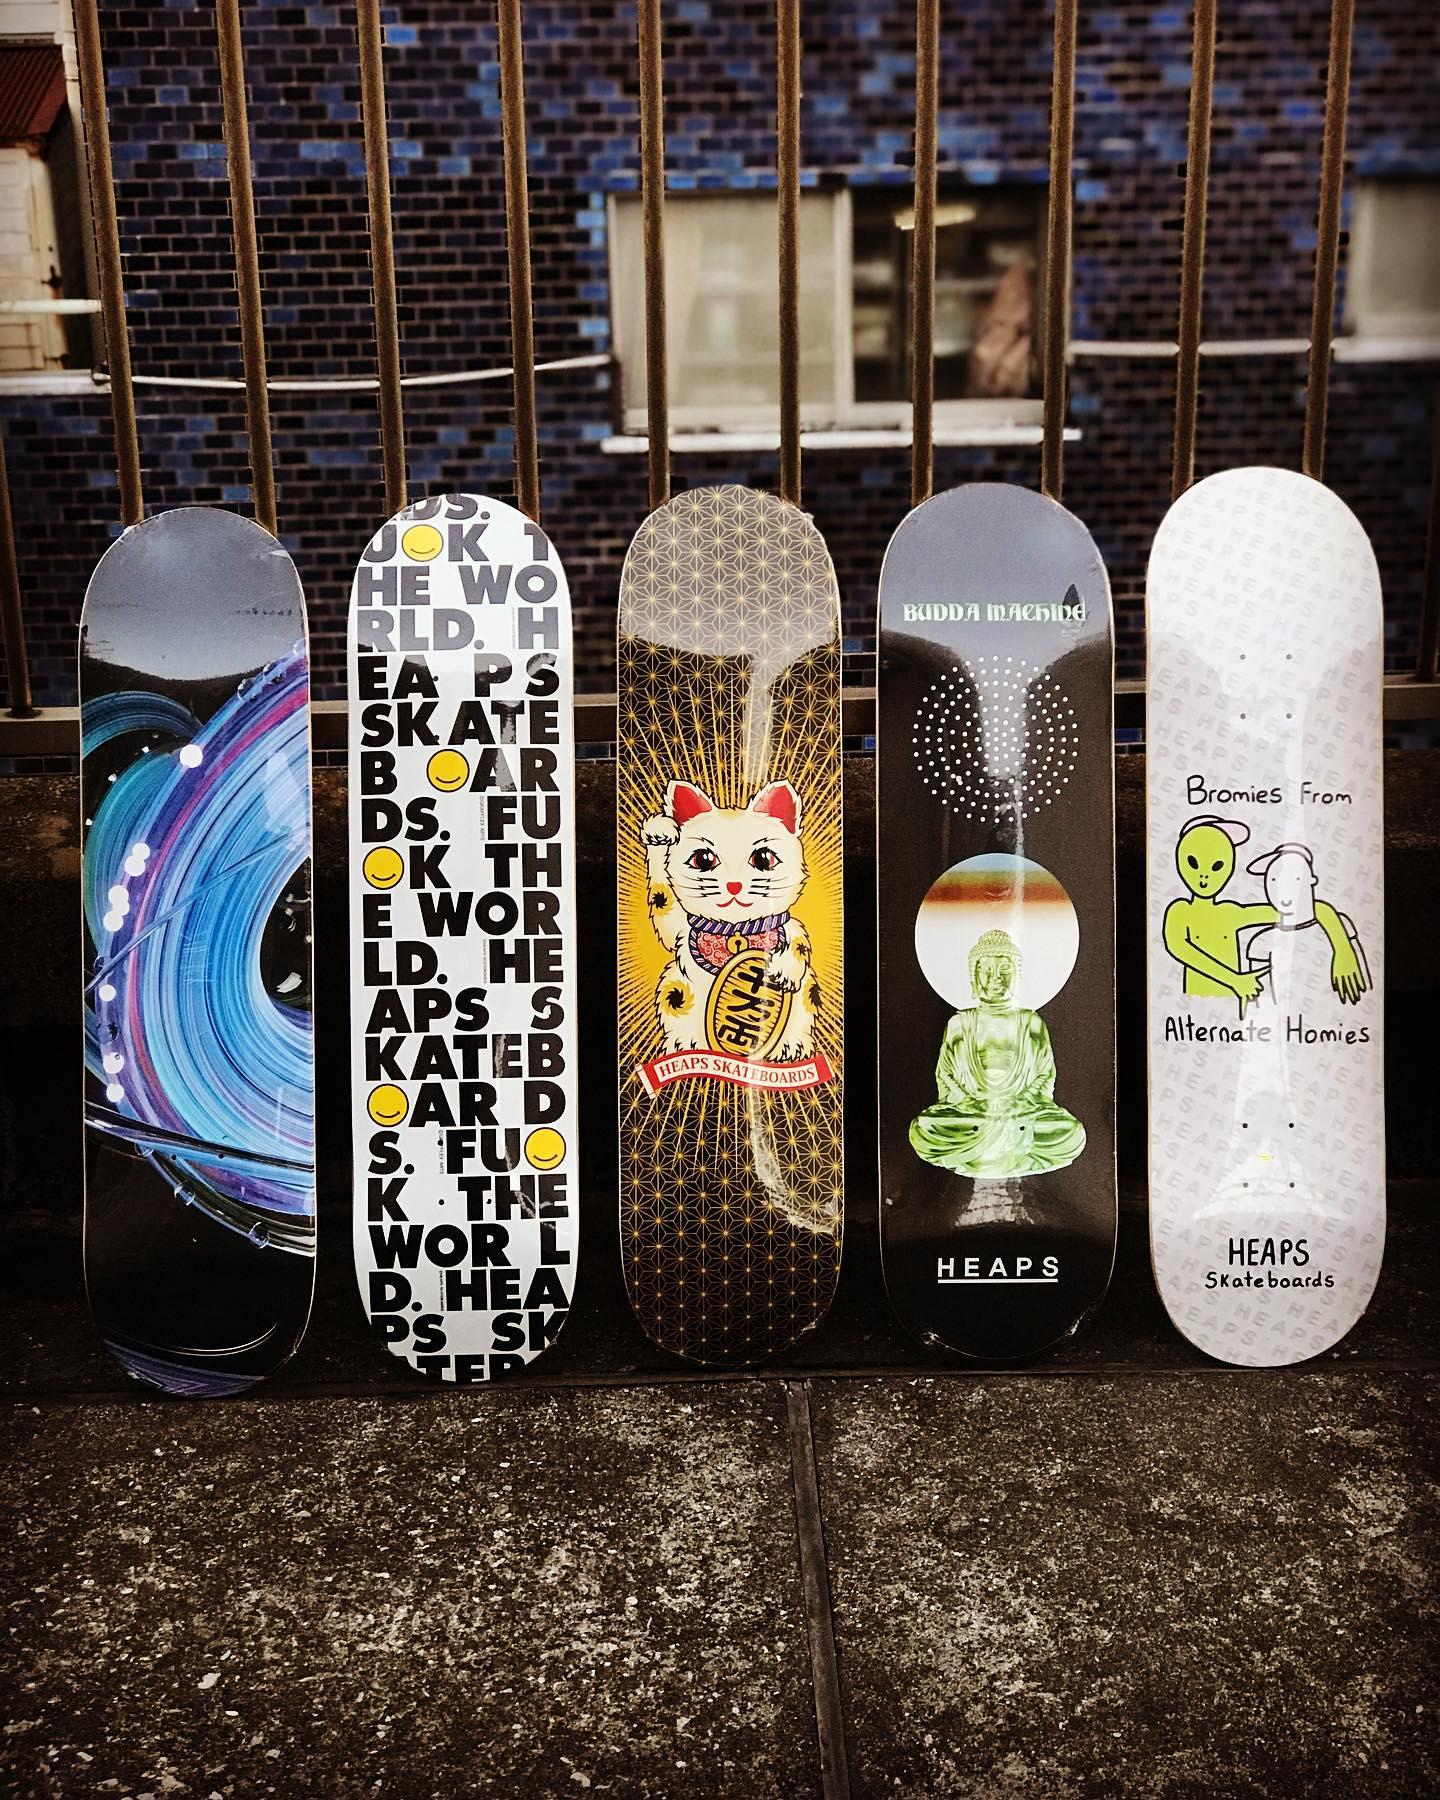 "・New @heaps_skateboards decks.韓国発スケートボードカンパニー""HEAPS""。ブランドを手掛けるShin Jeong-hyukとInstantは旧知の仲で、Instantライダーの @masatomofujiwara & @raito.nema もライダーとして名を連ねています。中央の招き猫のグラフィックはローカル @nob_honeyanddeath デザインです。日本ではごく限られたショップのみで取り扱いとなっております。"